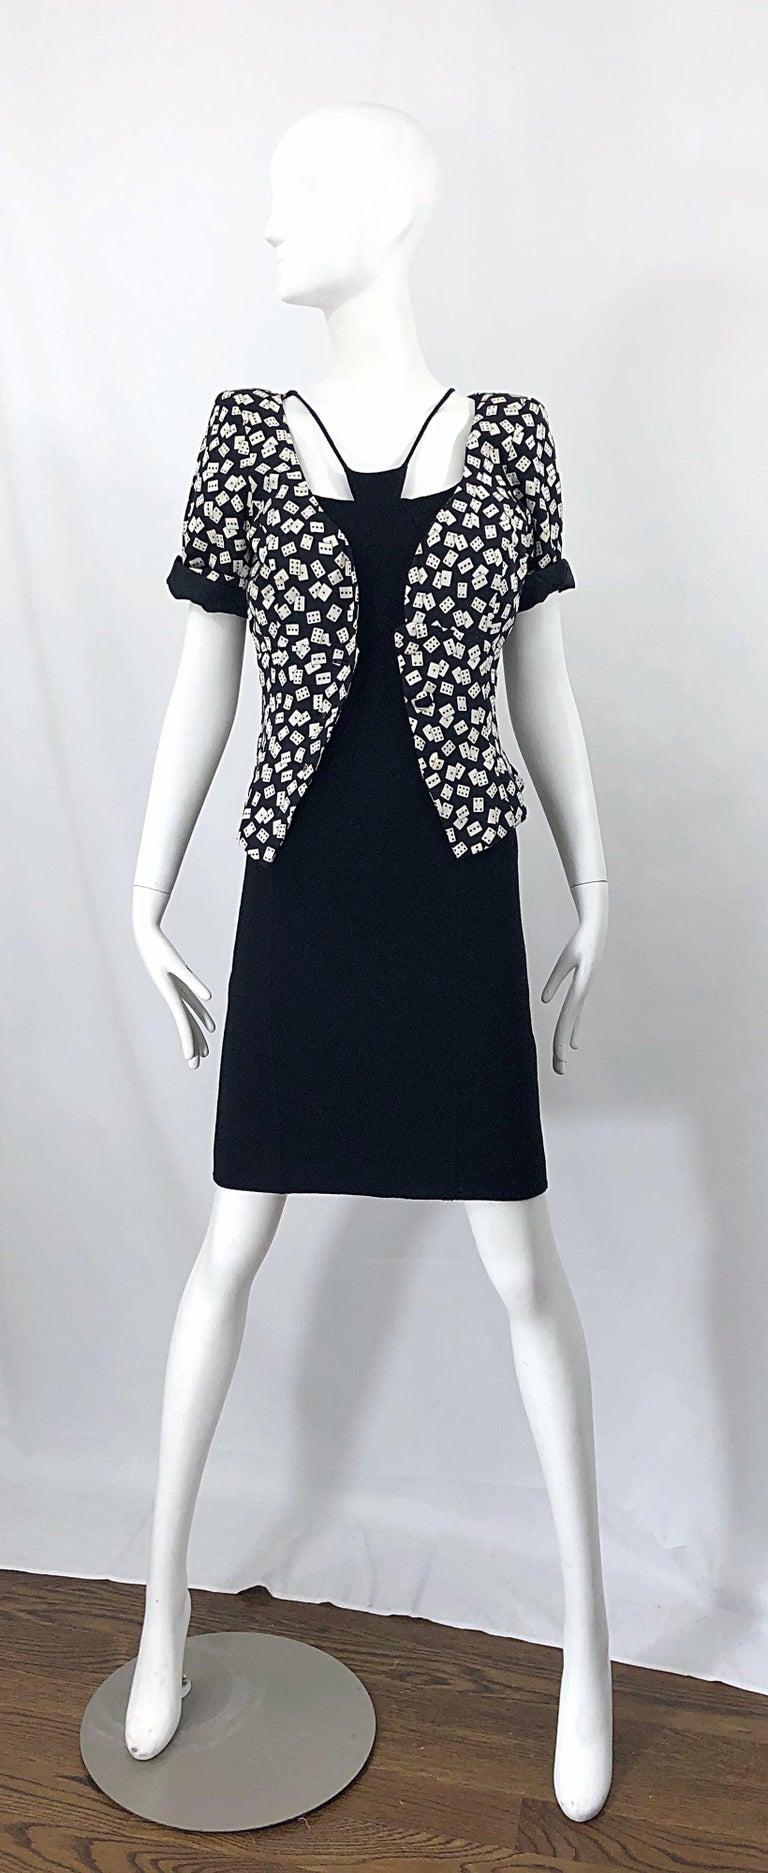 1990s Chado Ralph Rucci Rare Black Wool ' Bondage ' Vintage 90s Dress Size 4  For Sale 2